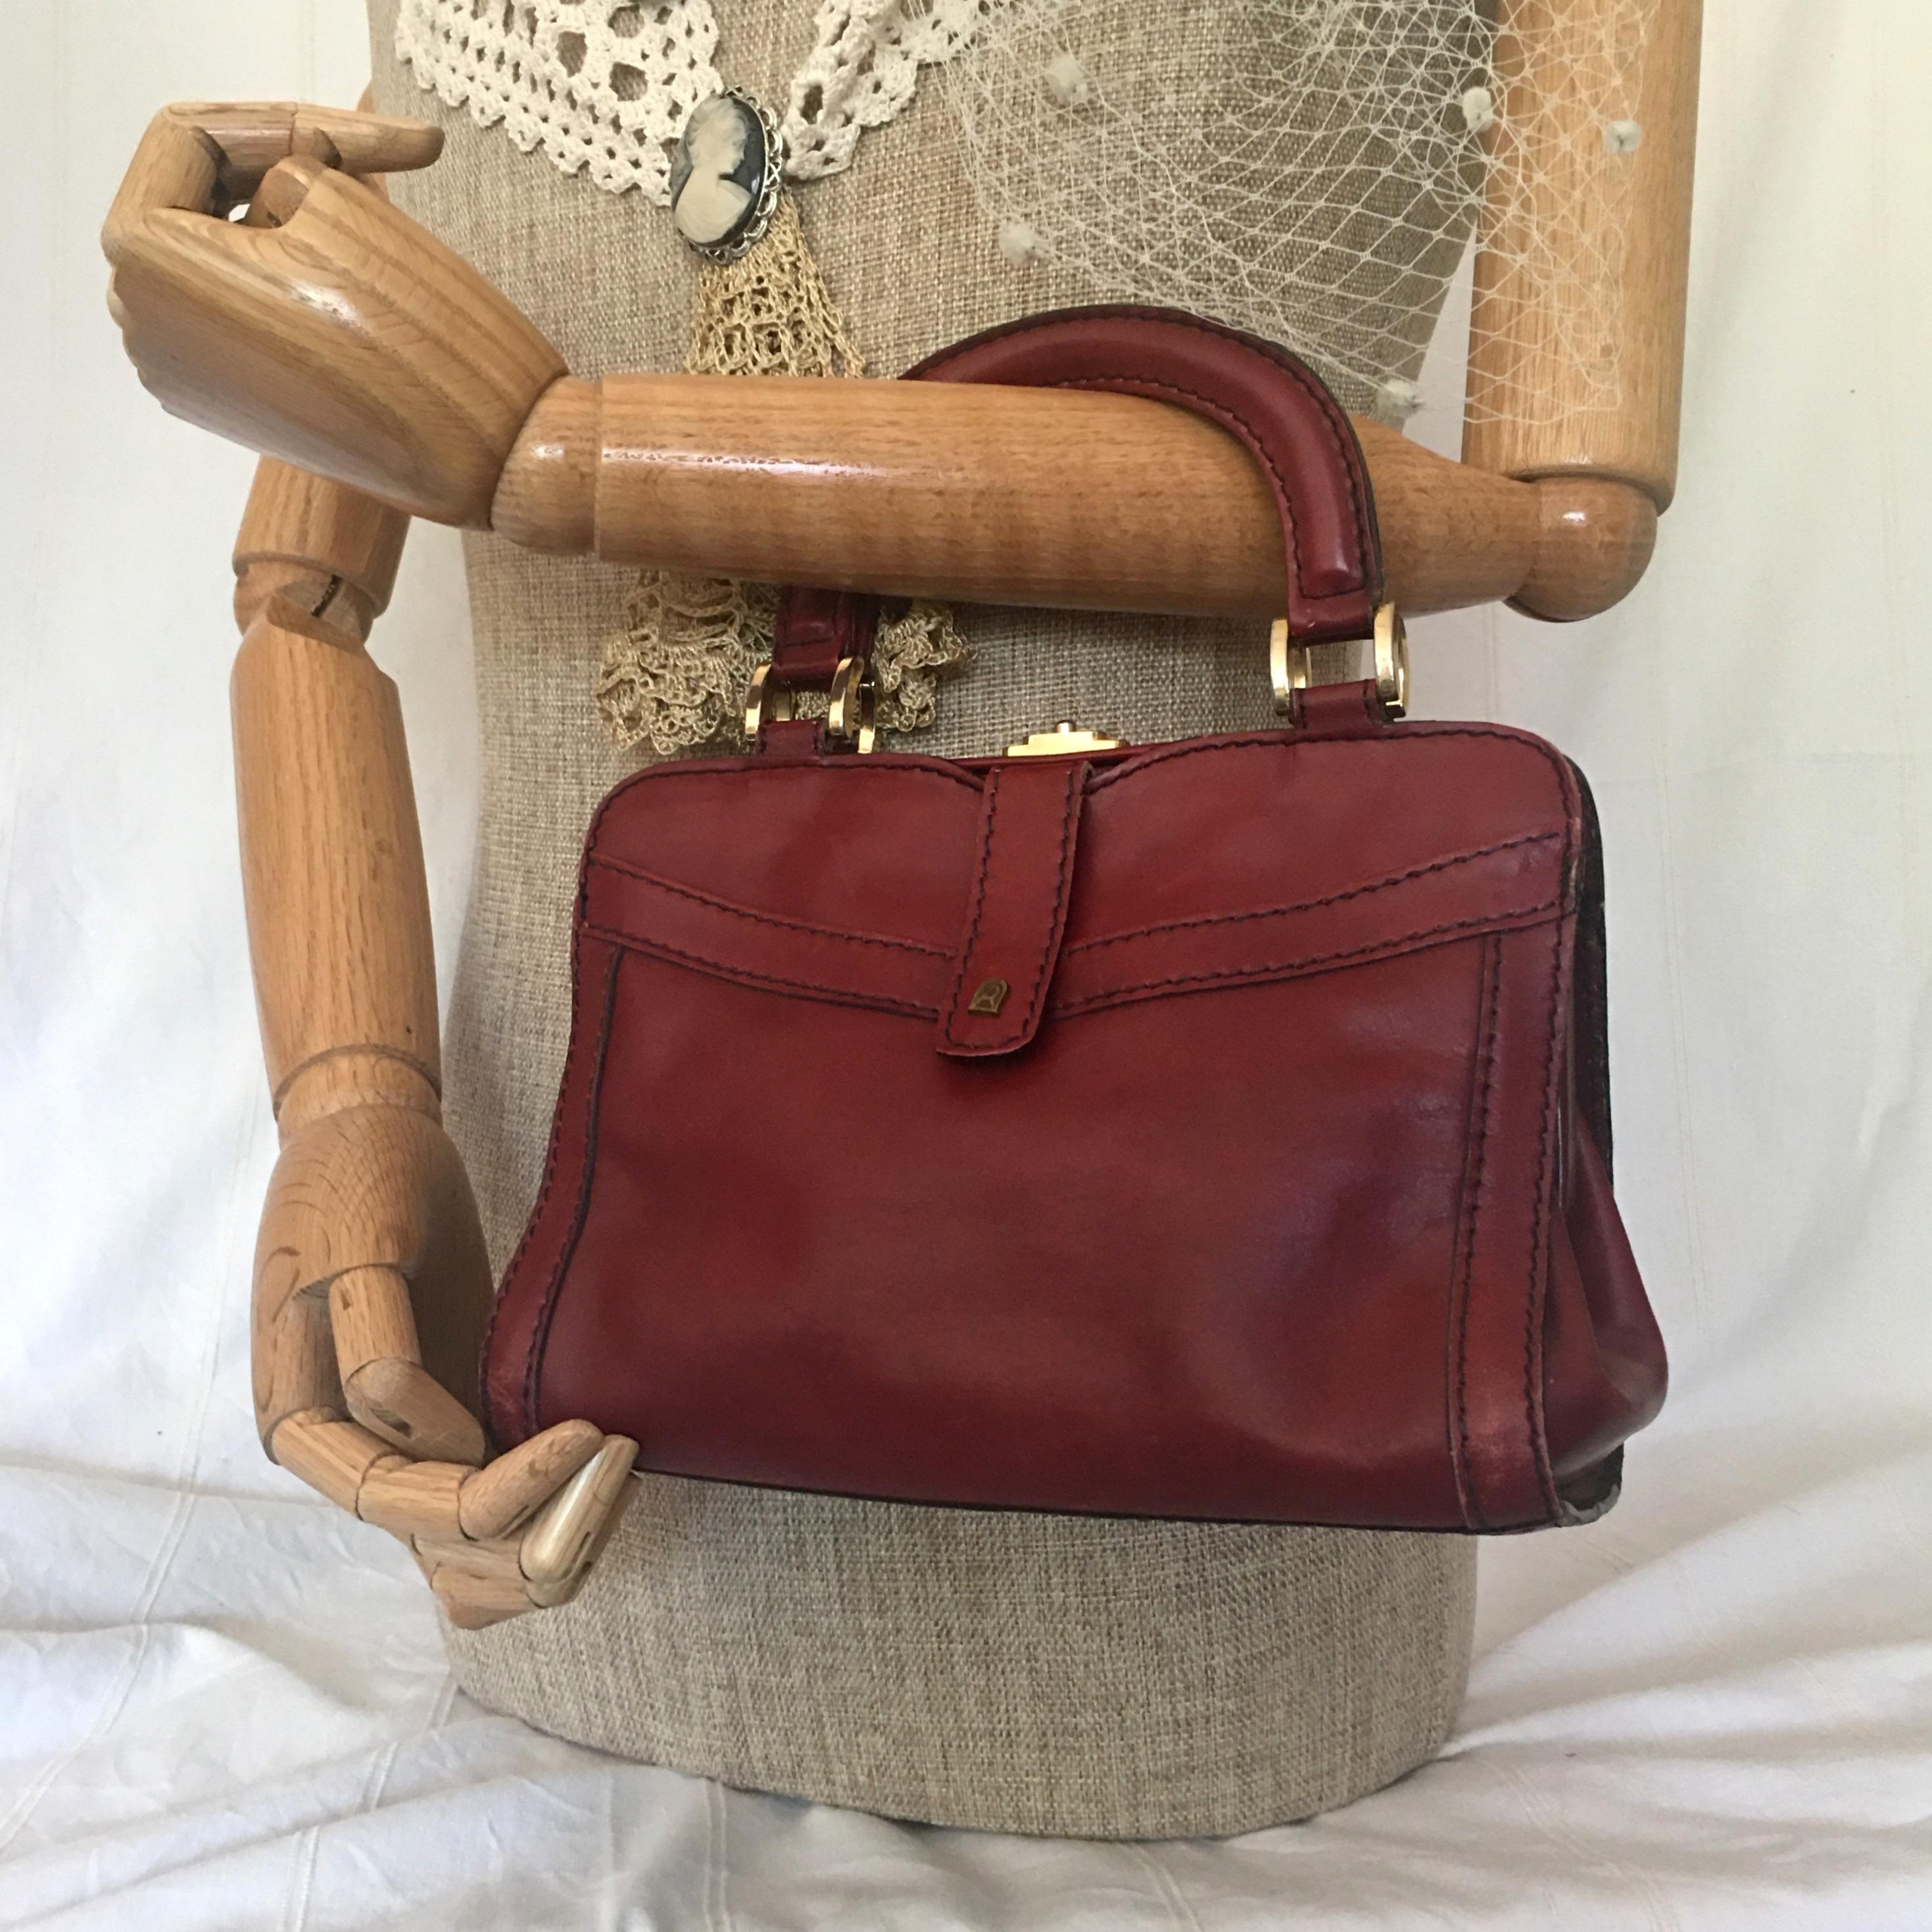 60s Vintage Burgundy Handbag